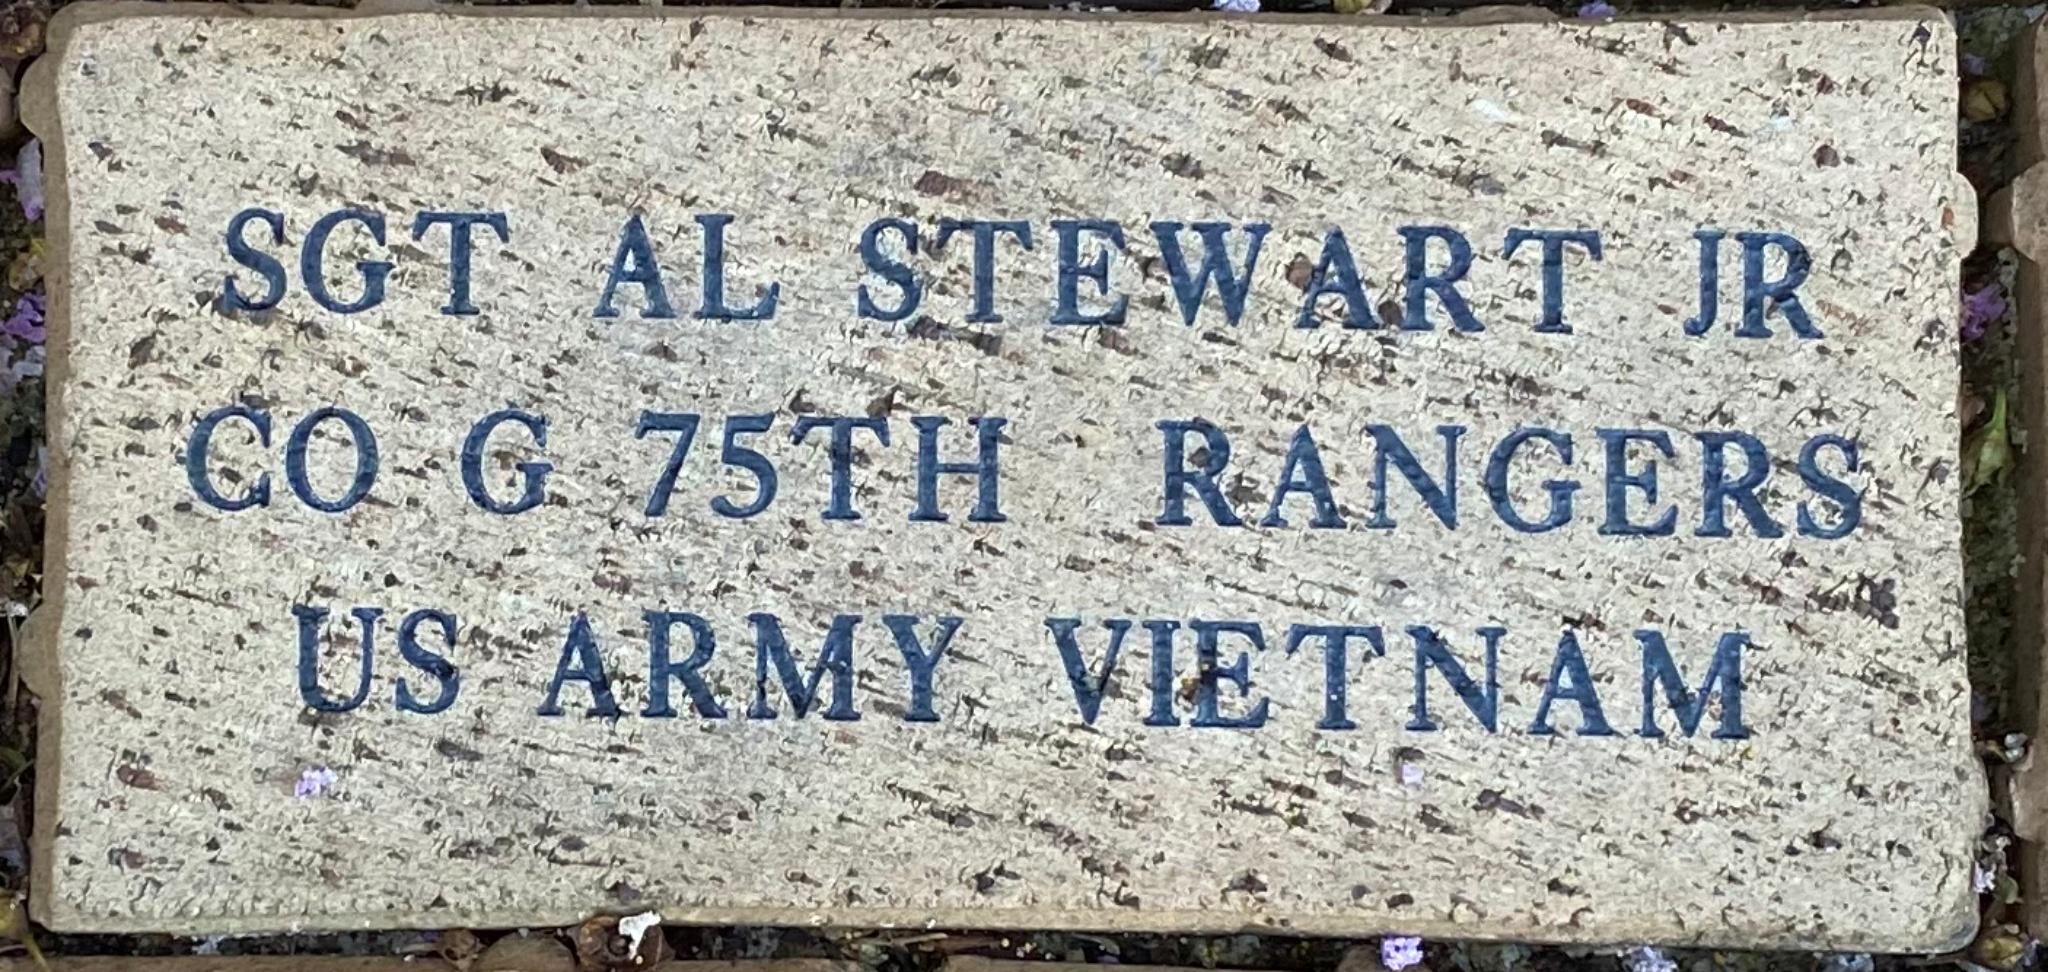 SGT AL STEWART JR CO G 75TH RANGERS US ARMY VIETNAM